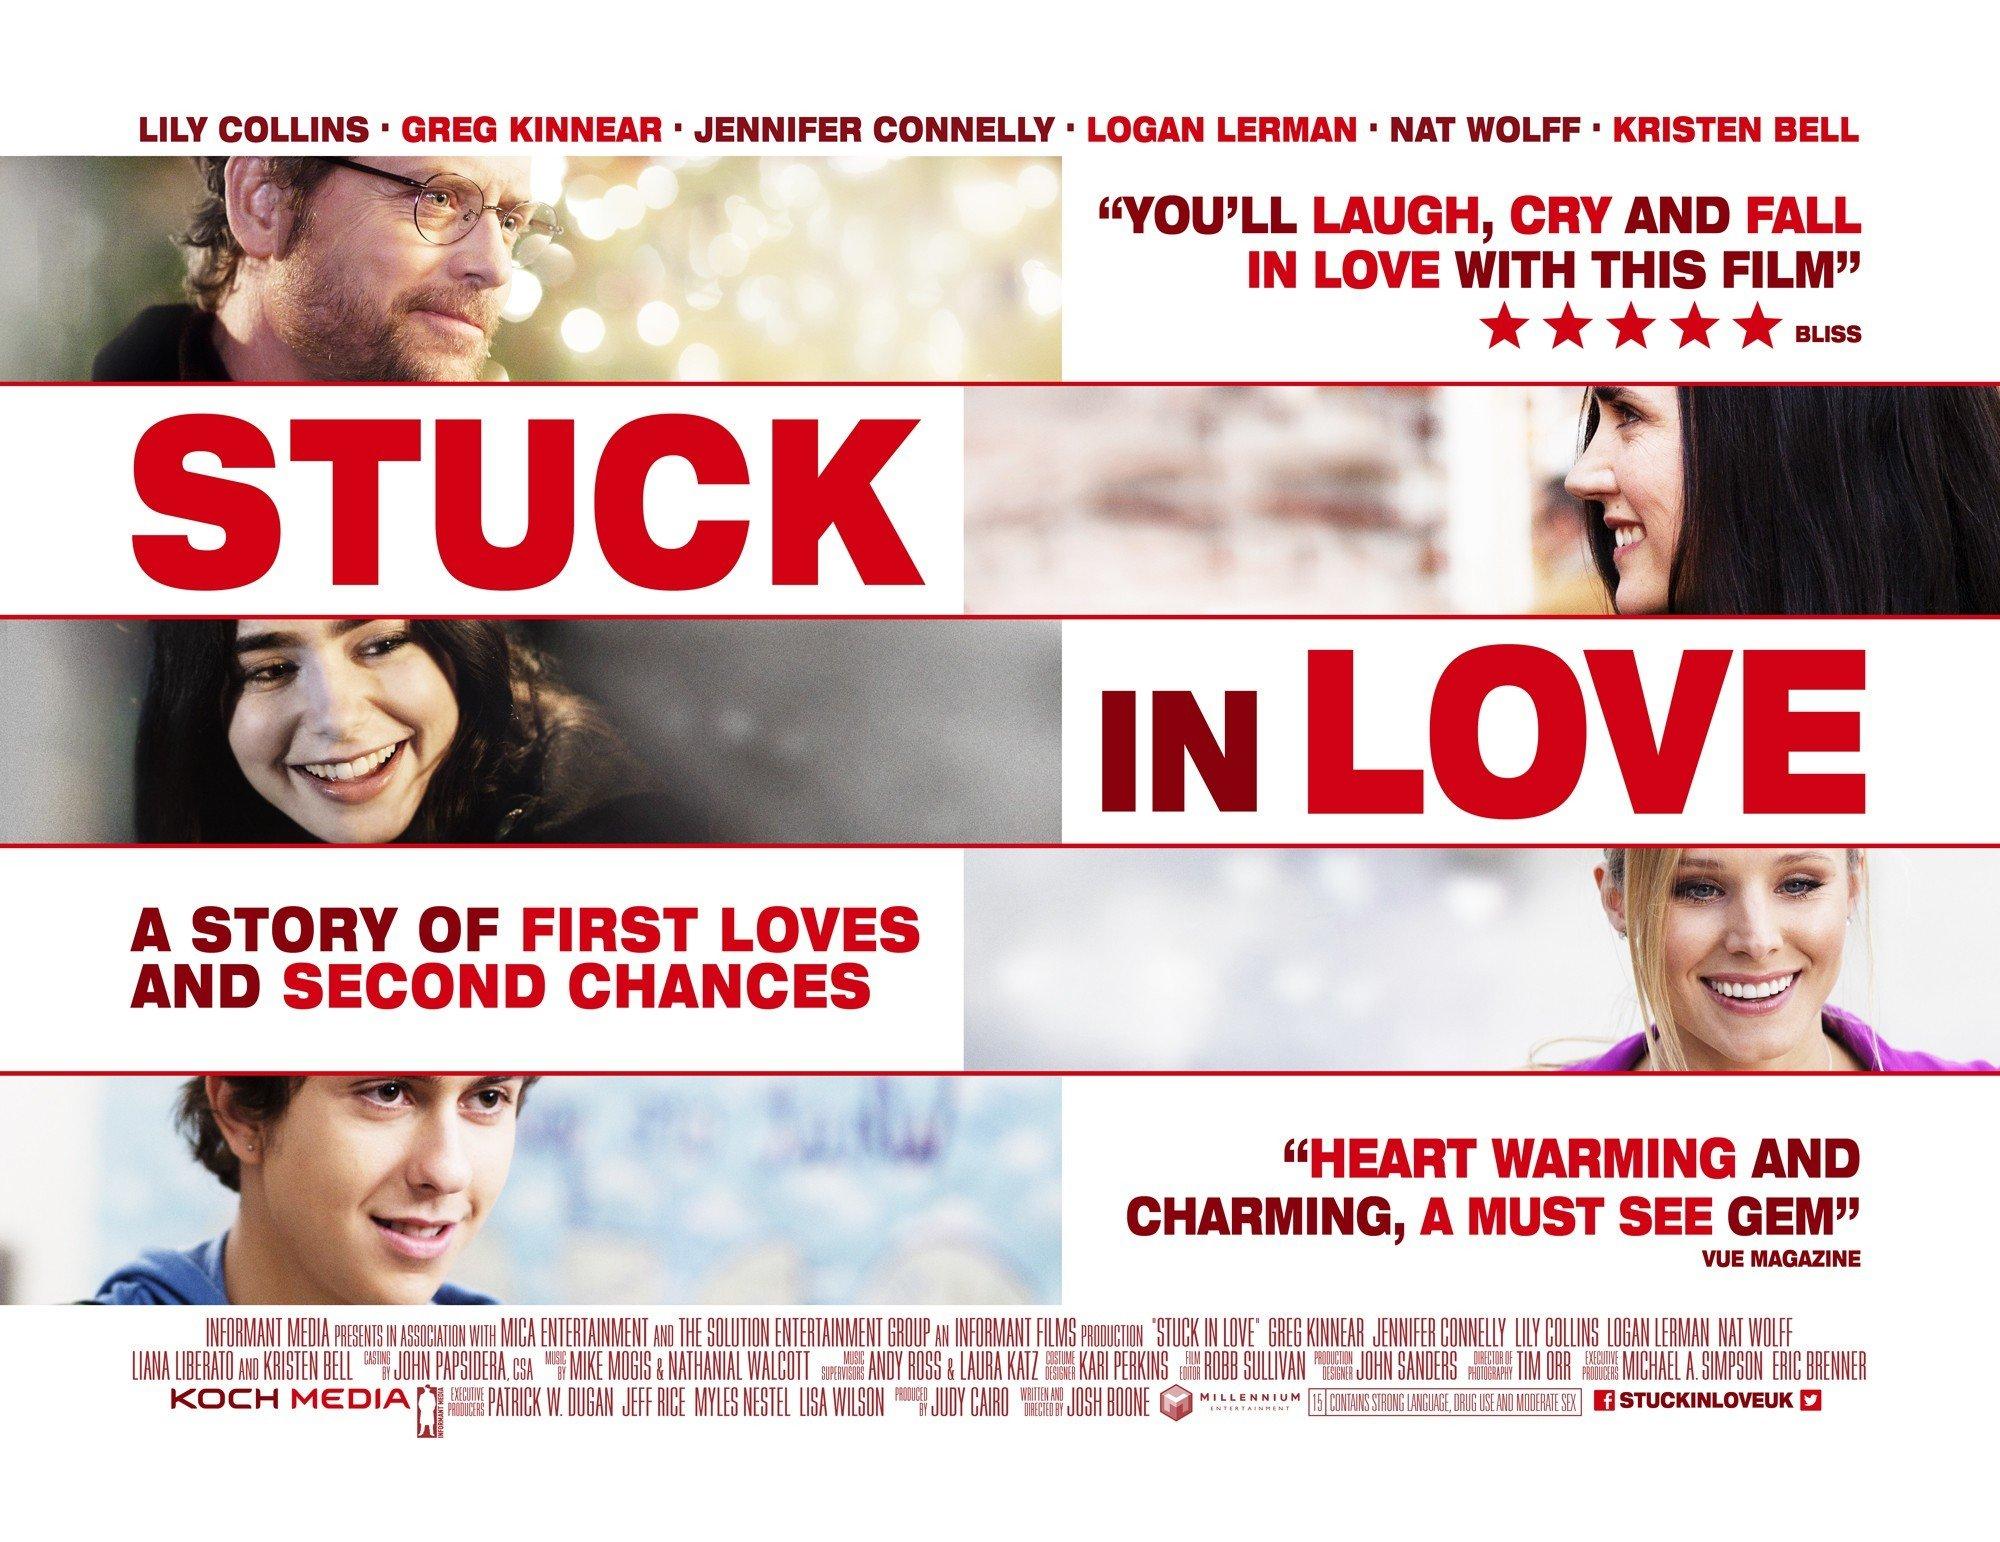 stuck-in-love-poster04.jpg